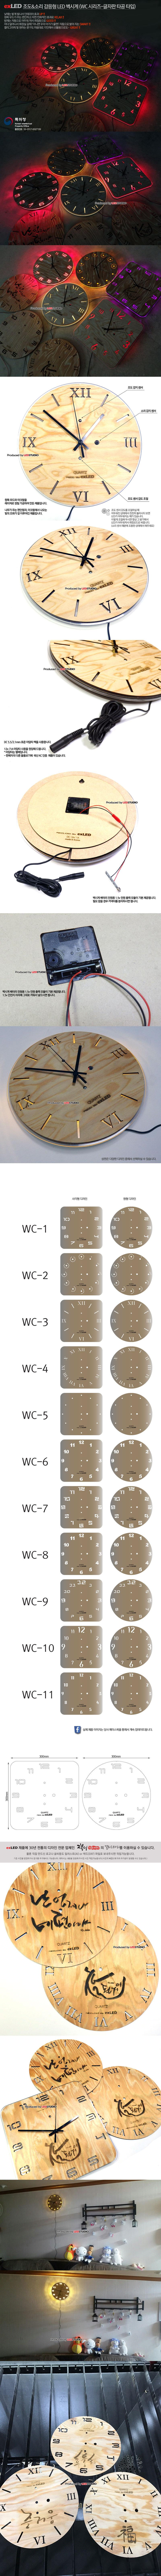 exLED 조도&소리 감응형 LED 벽시계 (WC 시리즈-글자판 타공 타입)